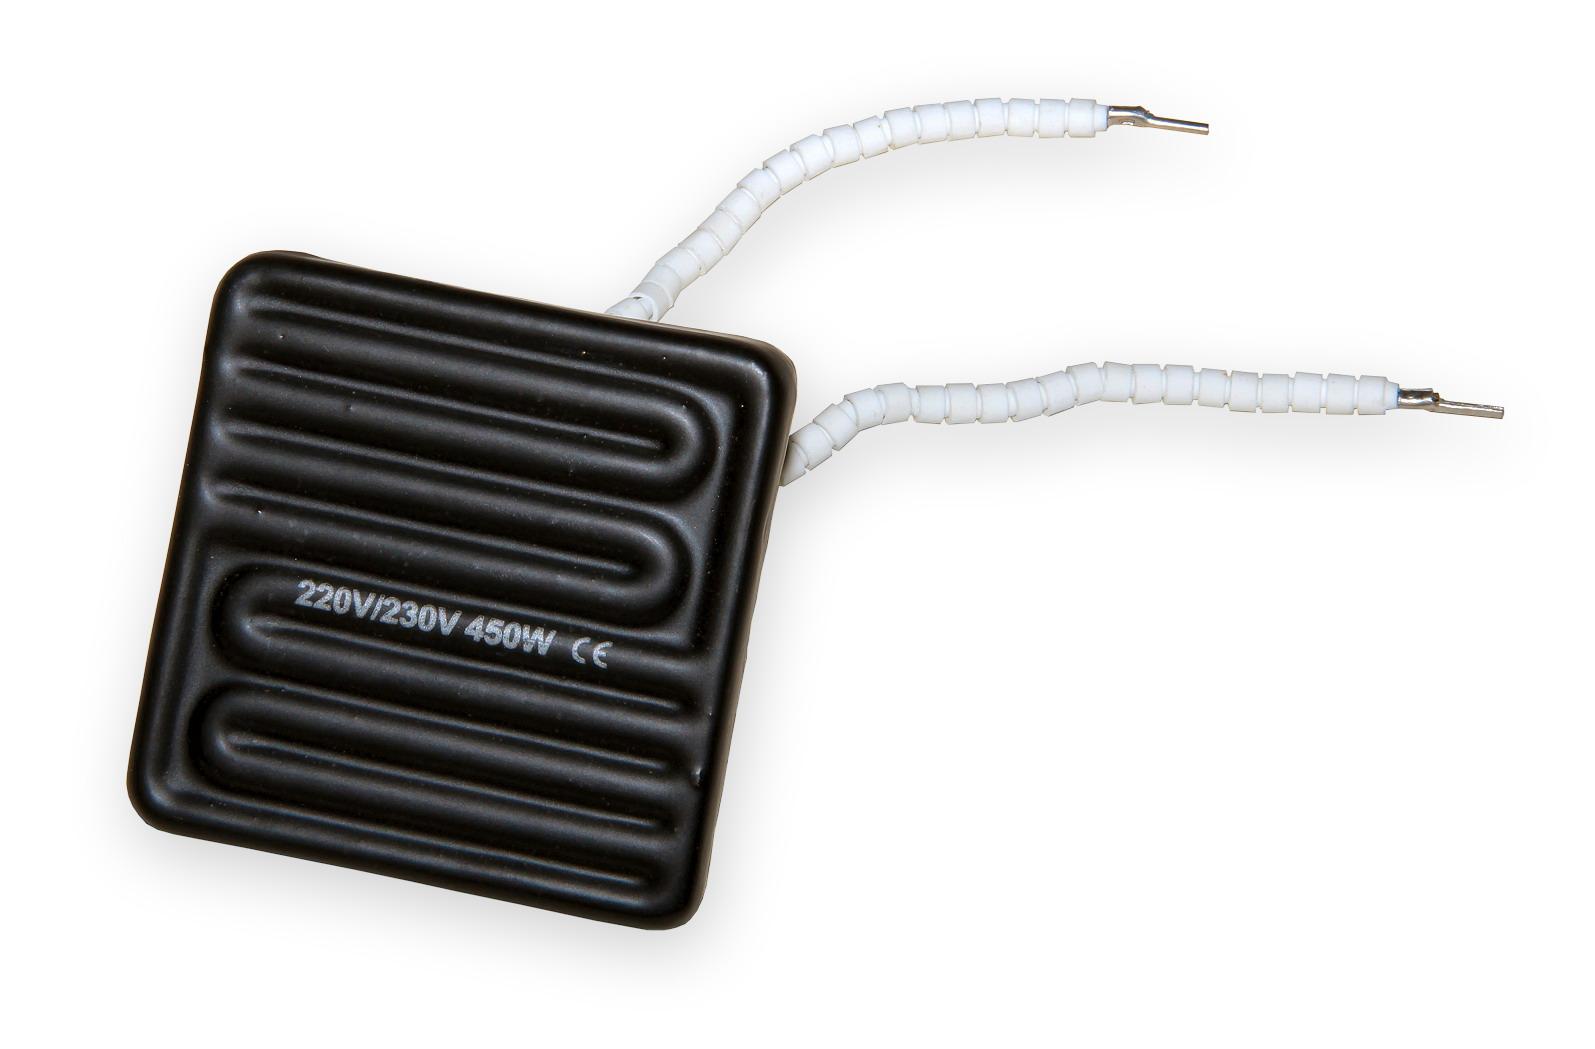 Náhradní infračervený zářič ke stanicím iR6000 a iR6500